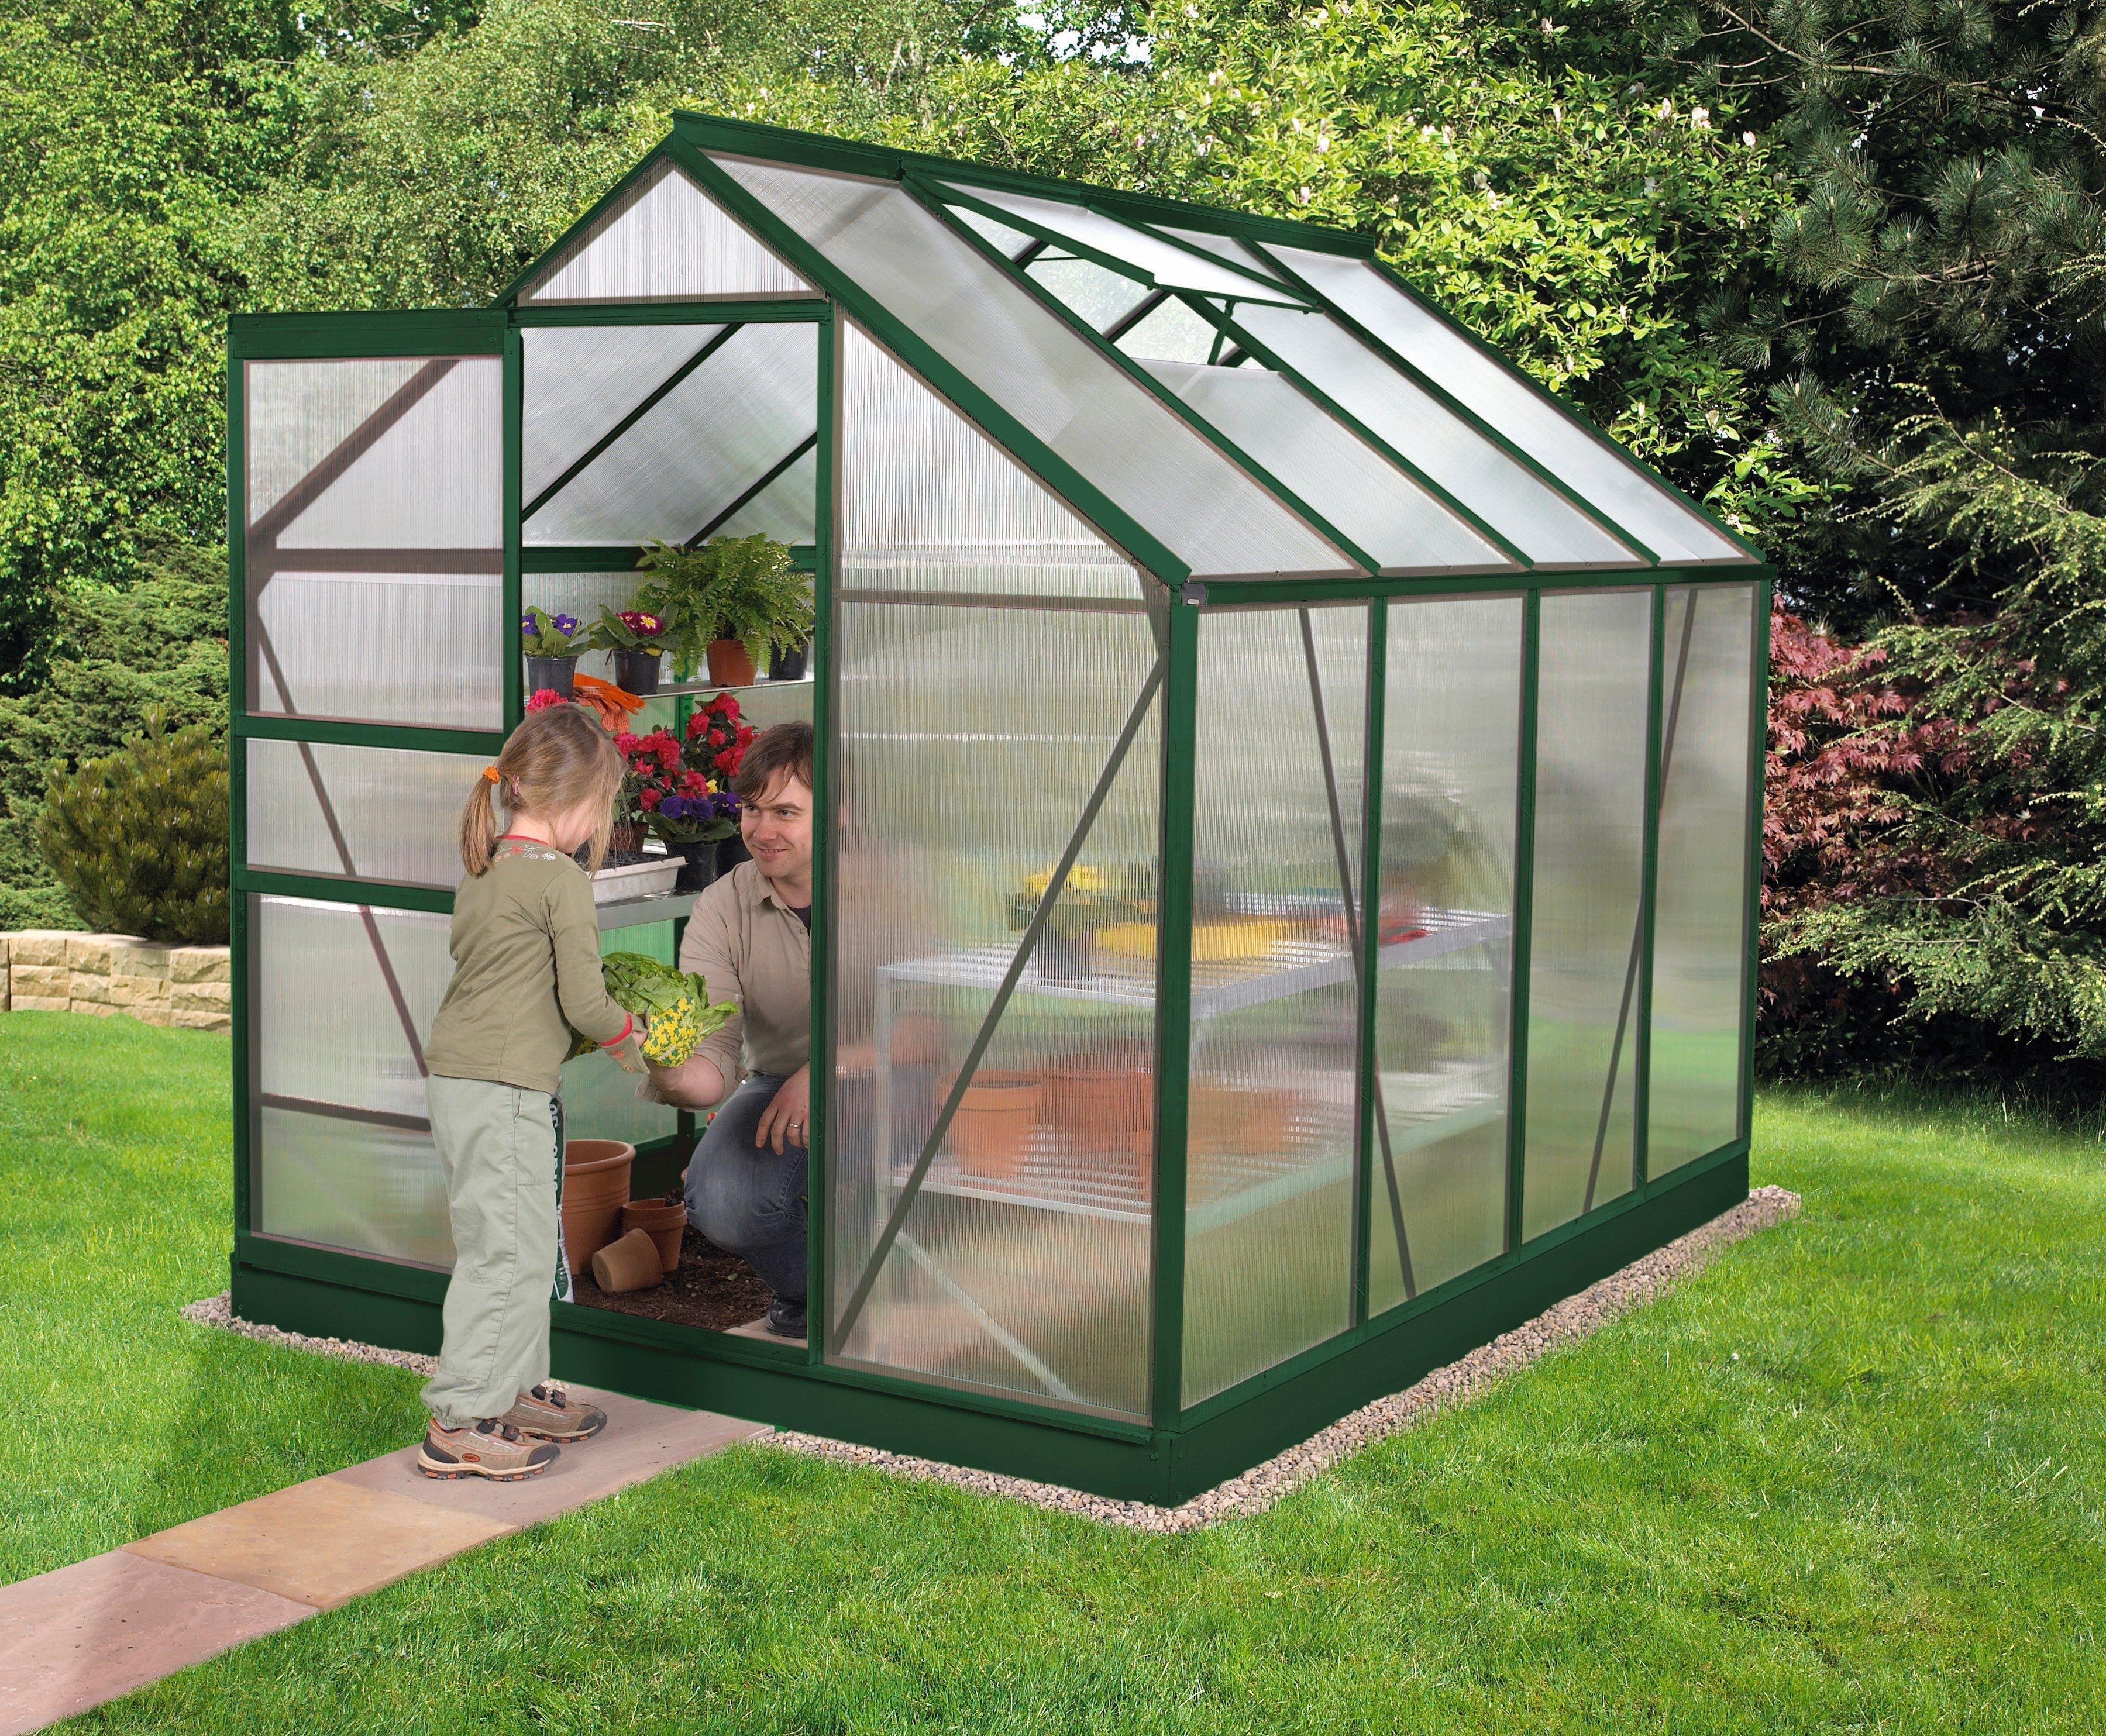 VITAVIA Gewächshaus »Venus 5000«, B/T/H: 192/254/197 cm, grün, 4 mm | Garten > Gewächshäuser | Vitavia